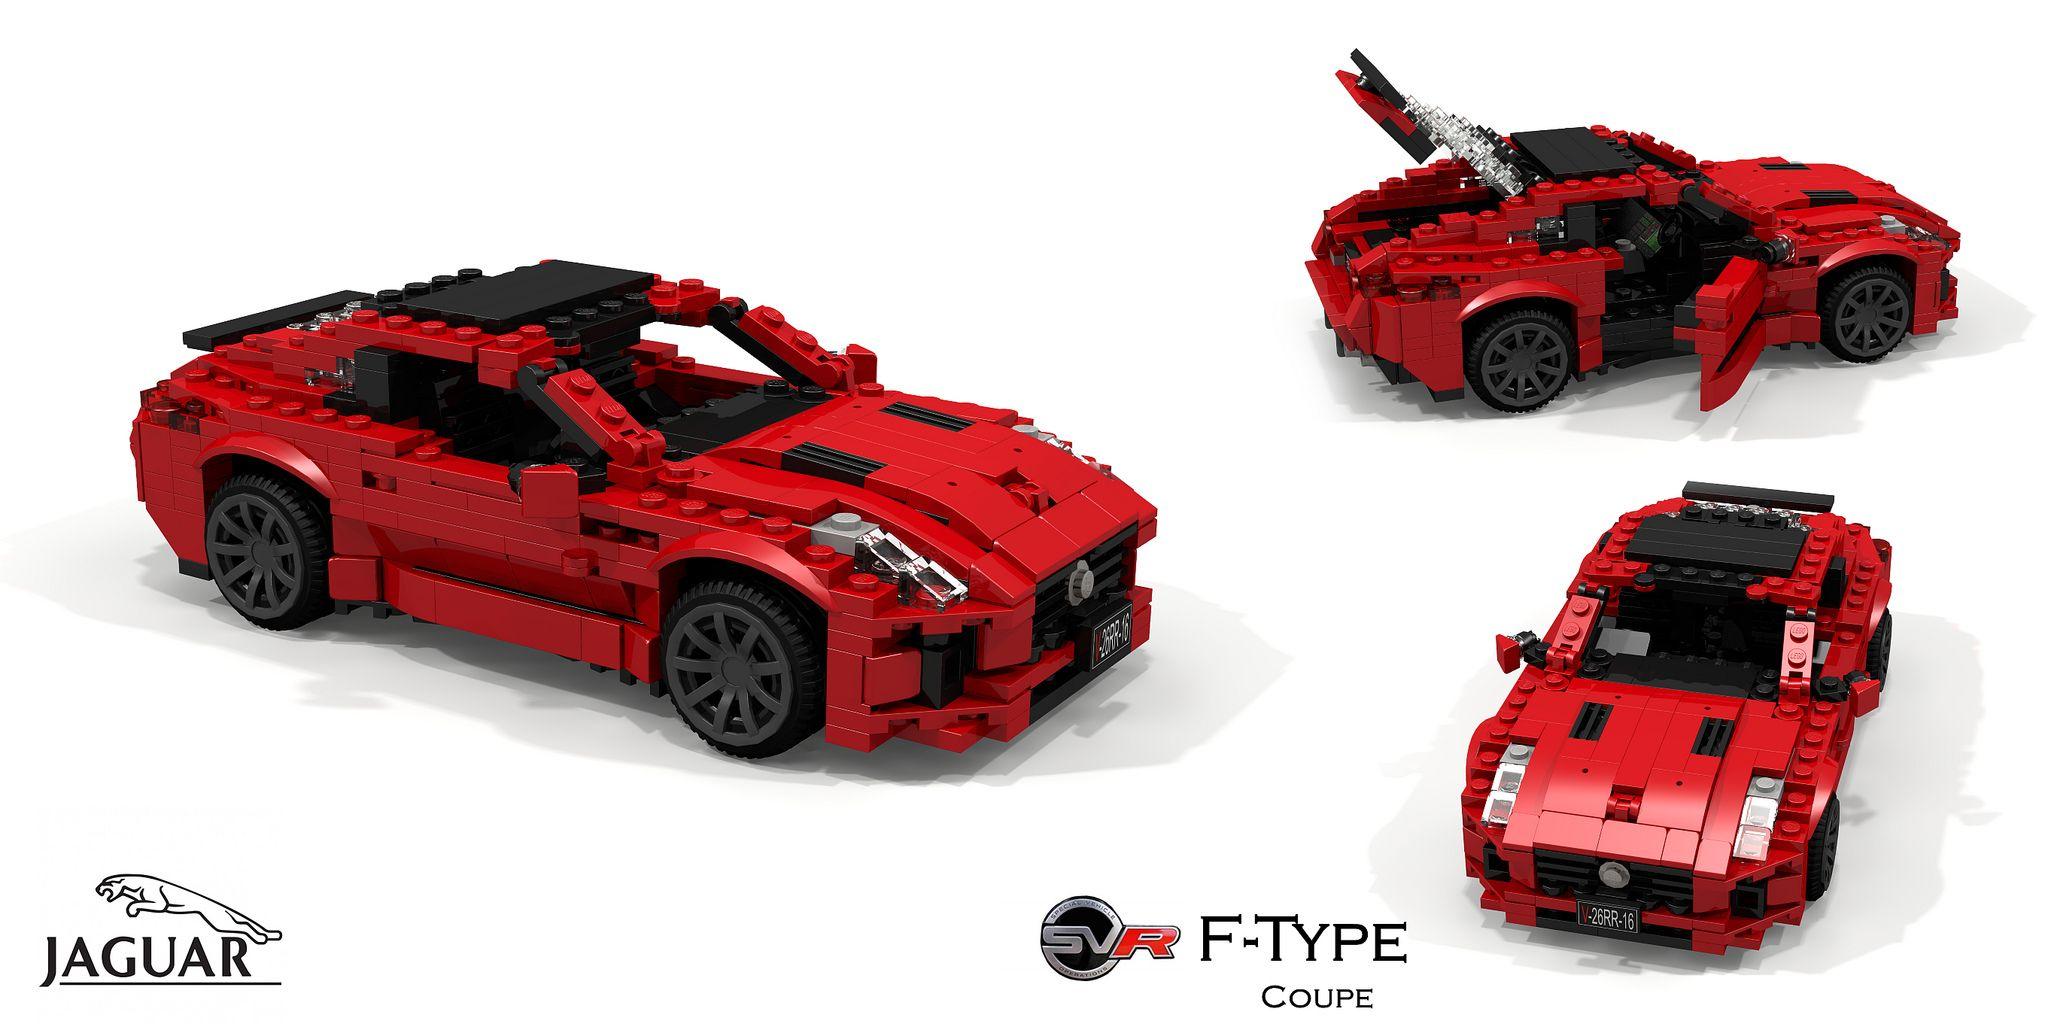 Jaguar F Type Svr Coupe Jaguar F Type Jaguar Coupe